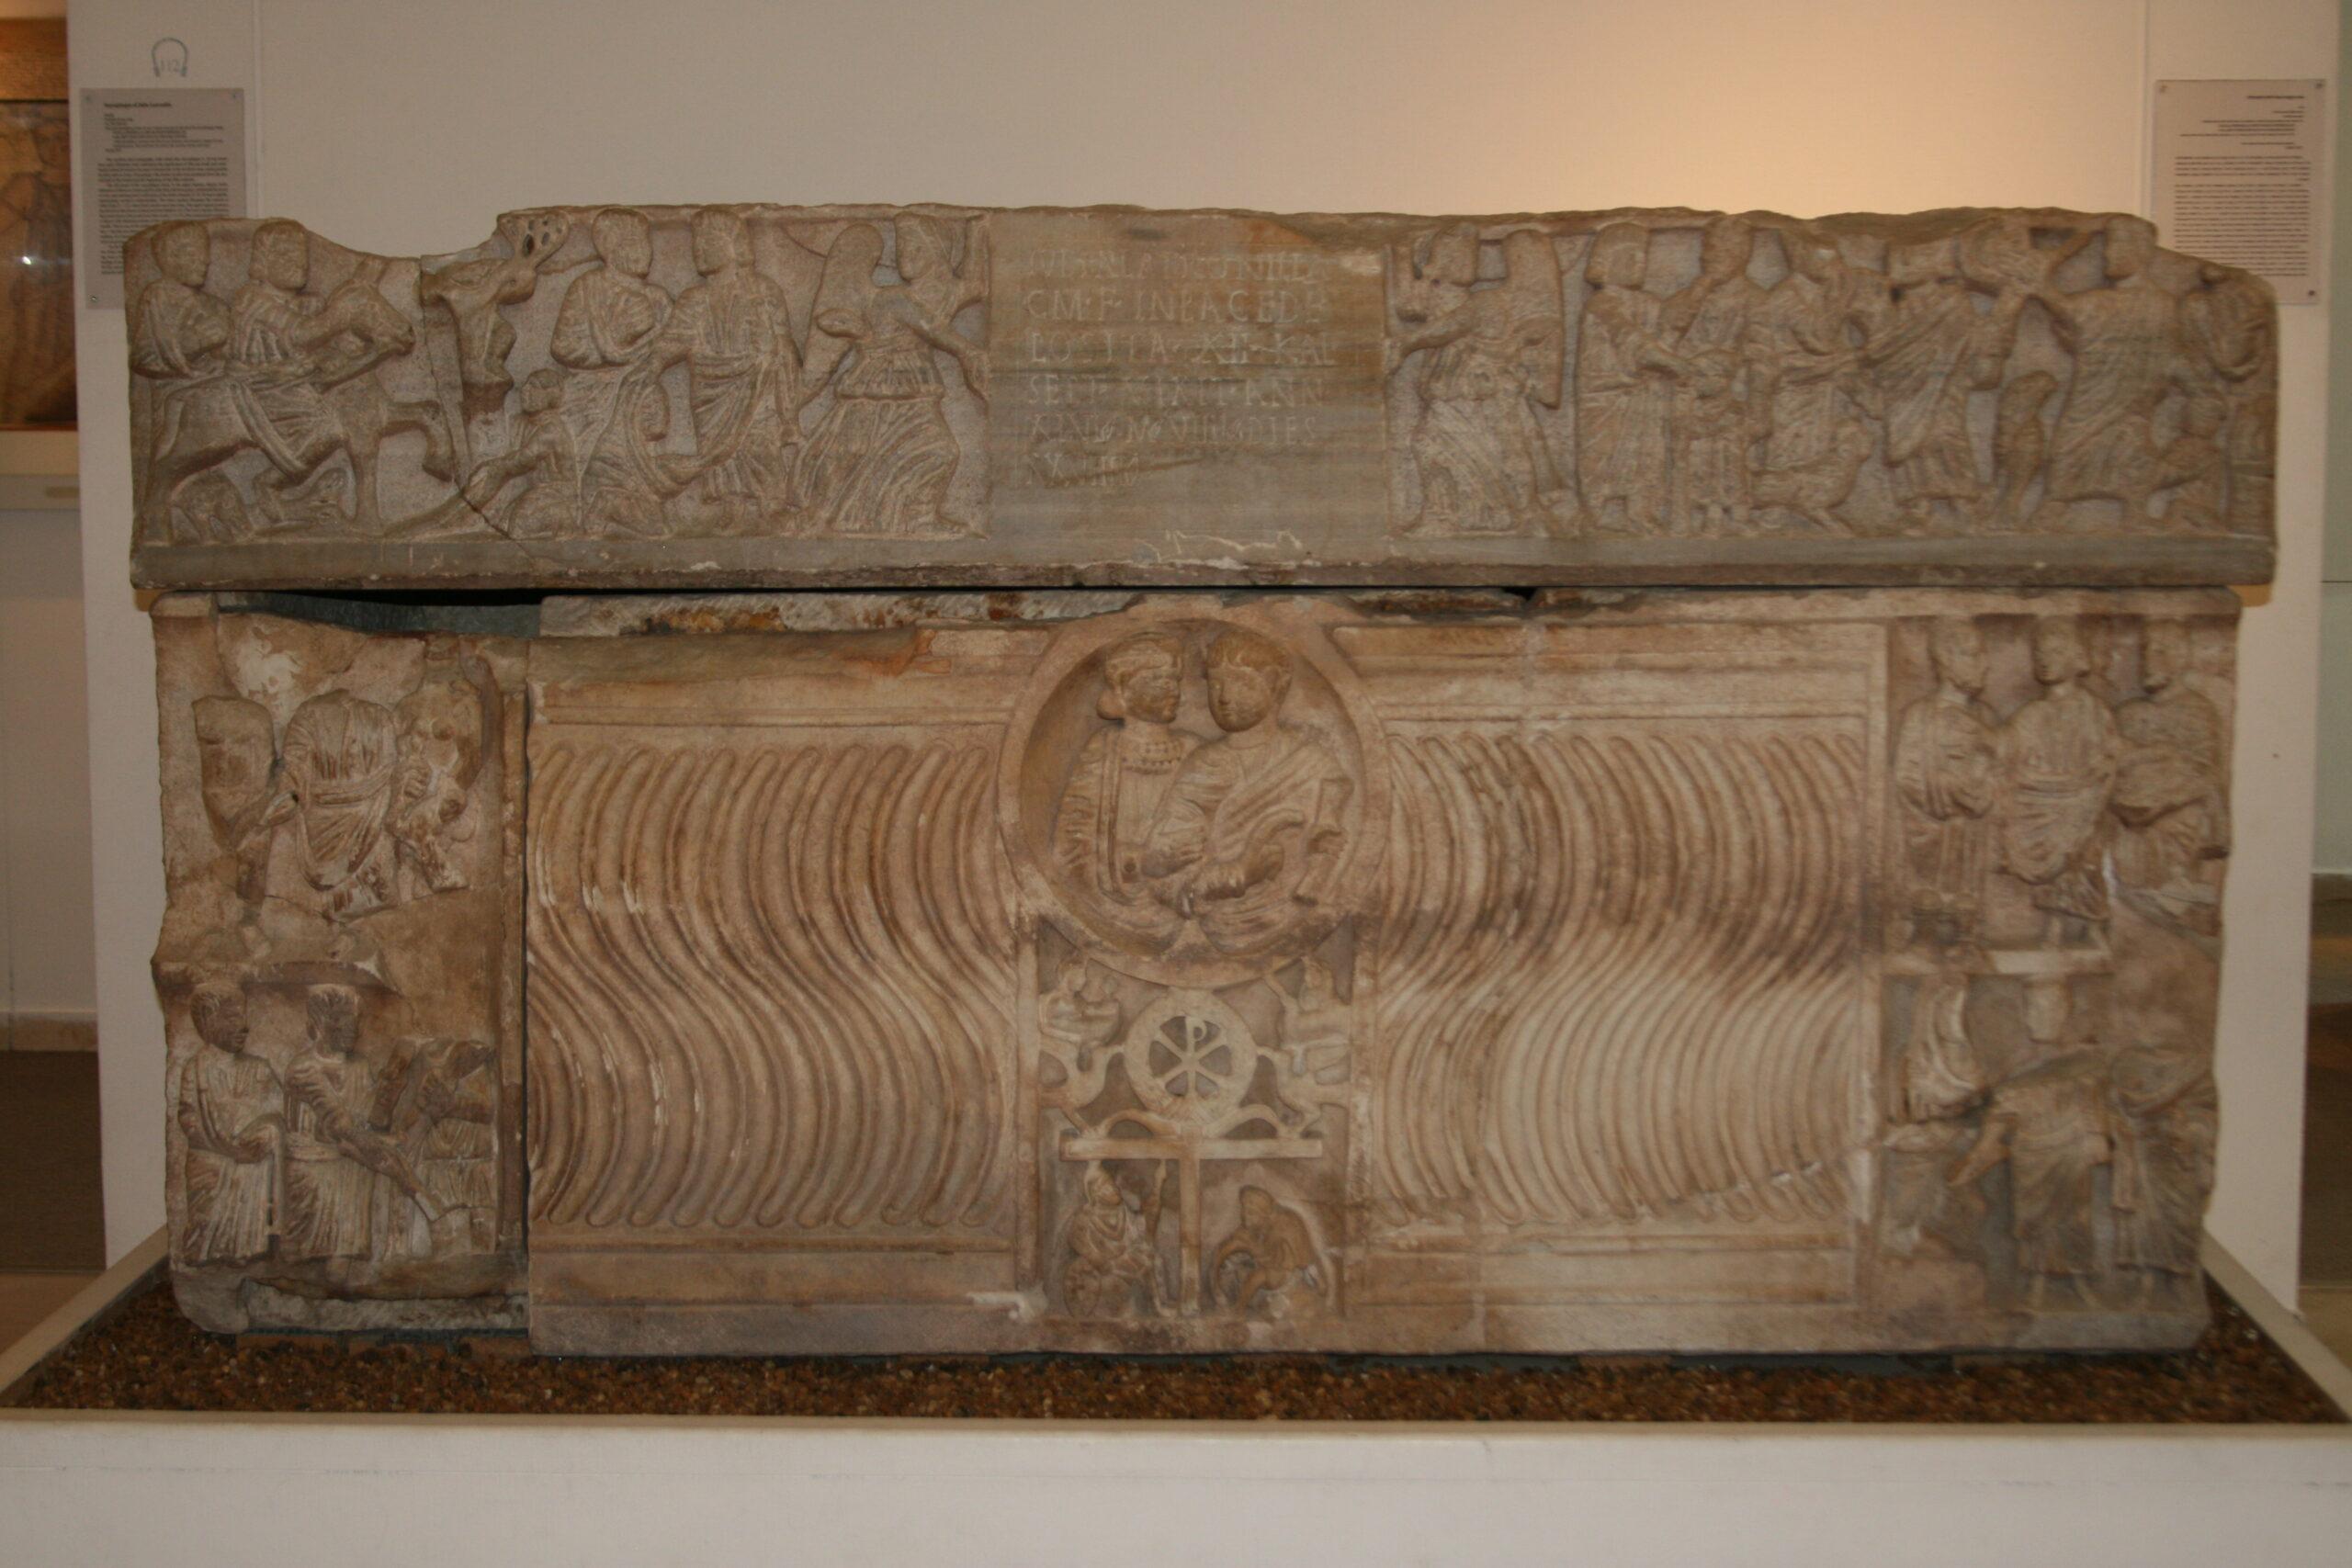 Figure 1. Sarcophage de Iulia Latronilla. De Rome. 330-340. Bible Lands Museum de Jérusalem (Photo : auteur)